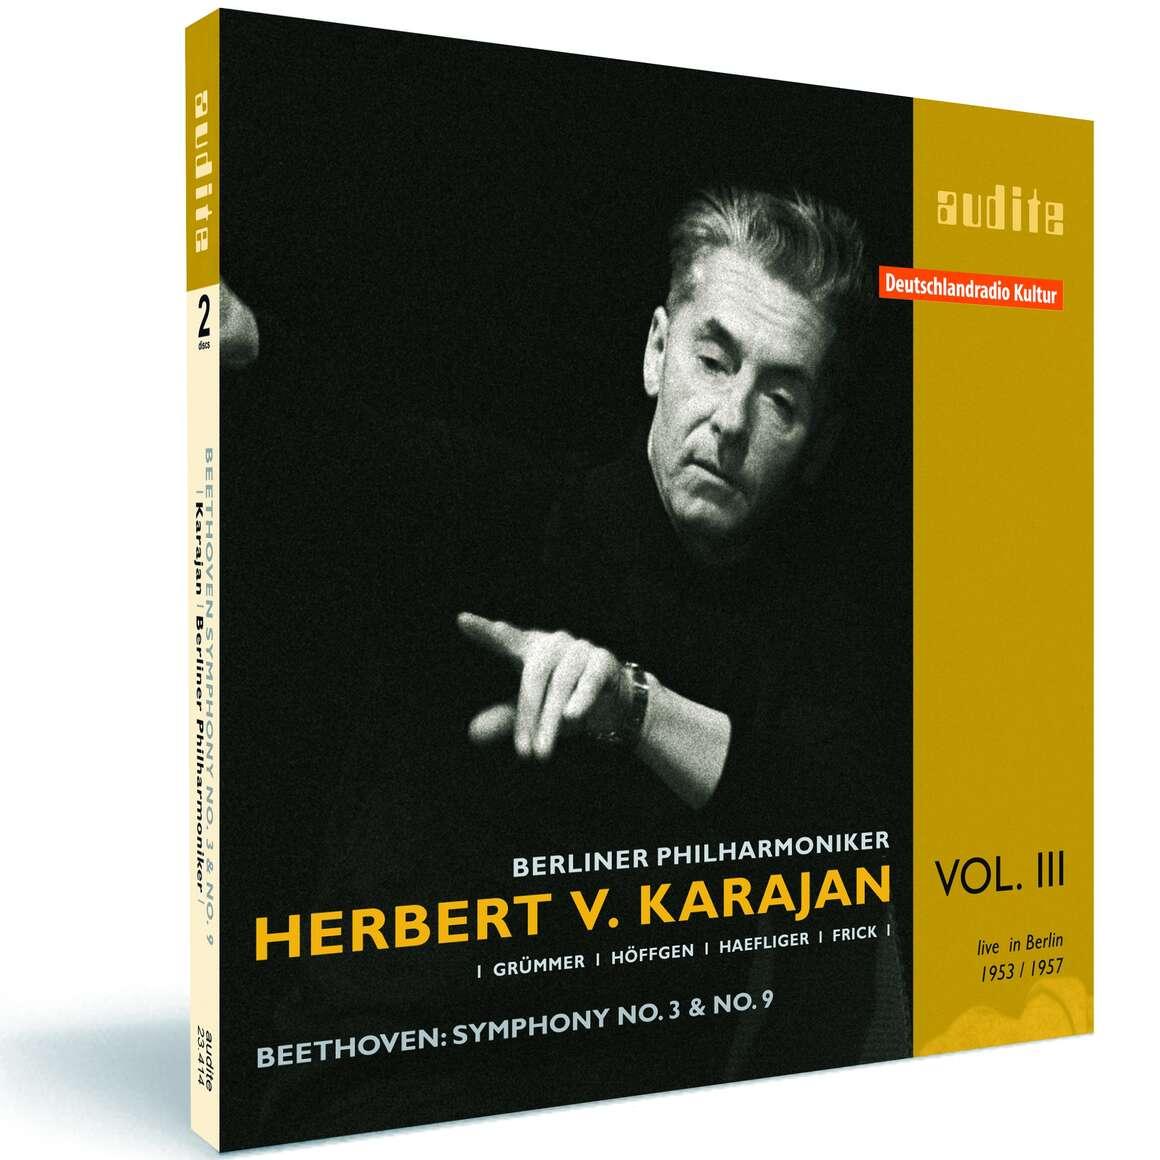 Edition von Karajan (III) – L. v. Beethoven: Symphony No. 3 ('Eroica') & No. 9